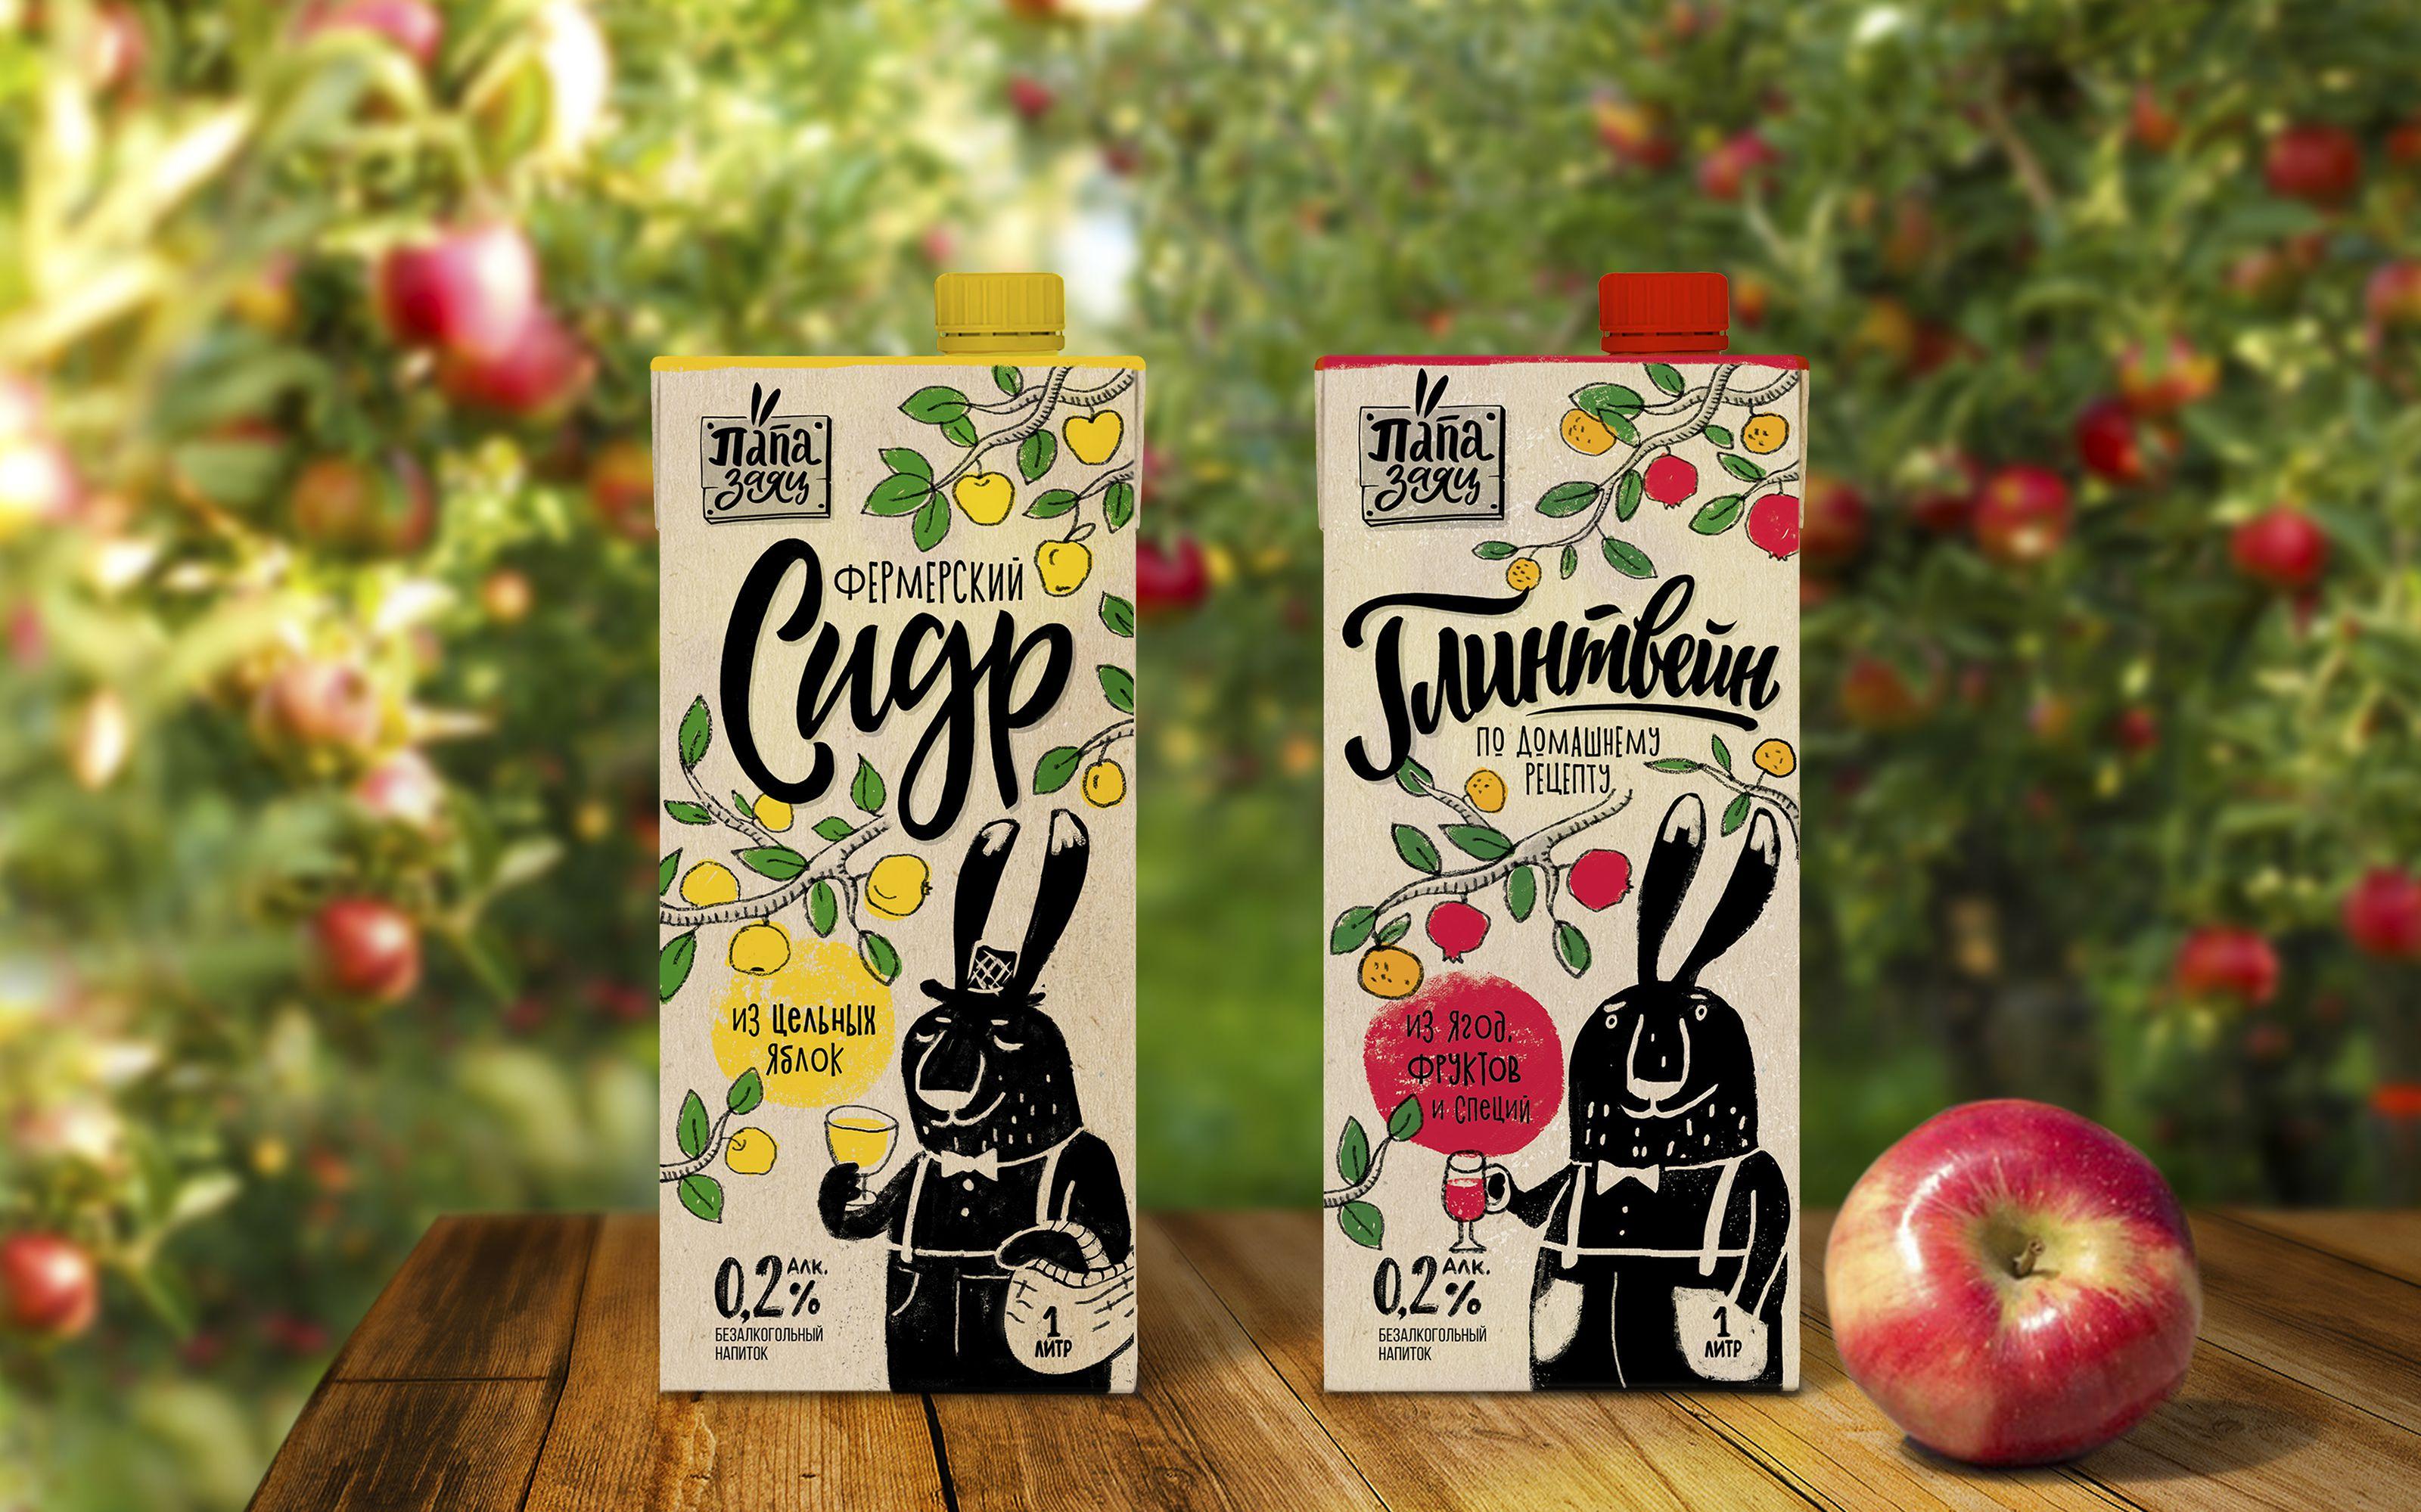 Разработка упаковки для бренда «Папа заяц»